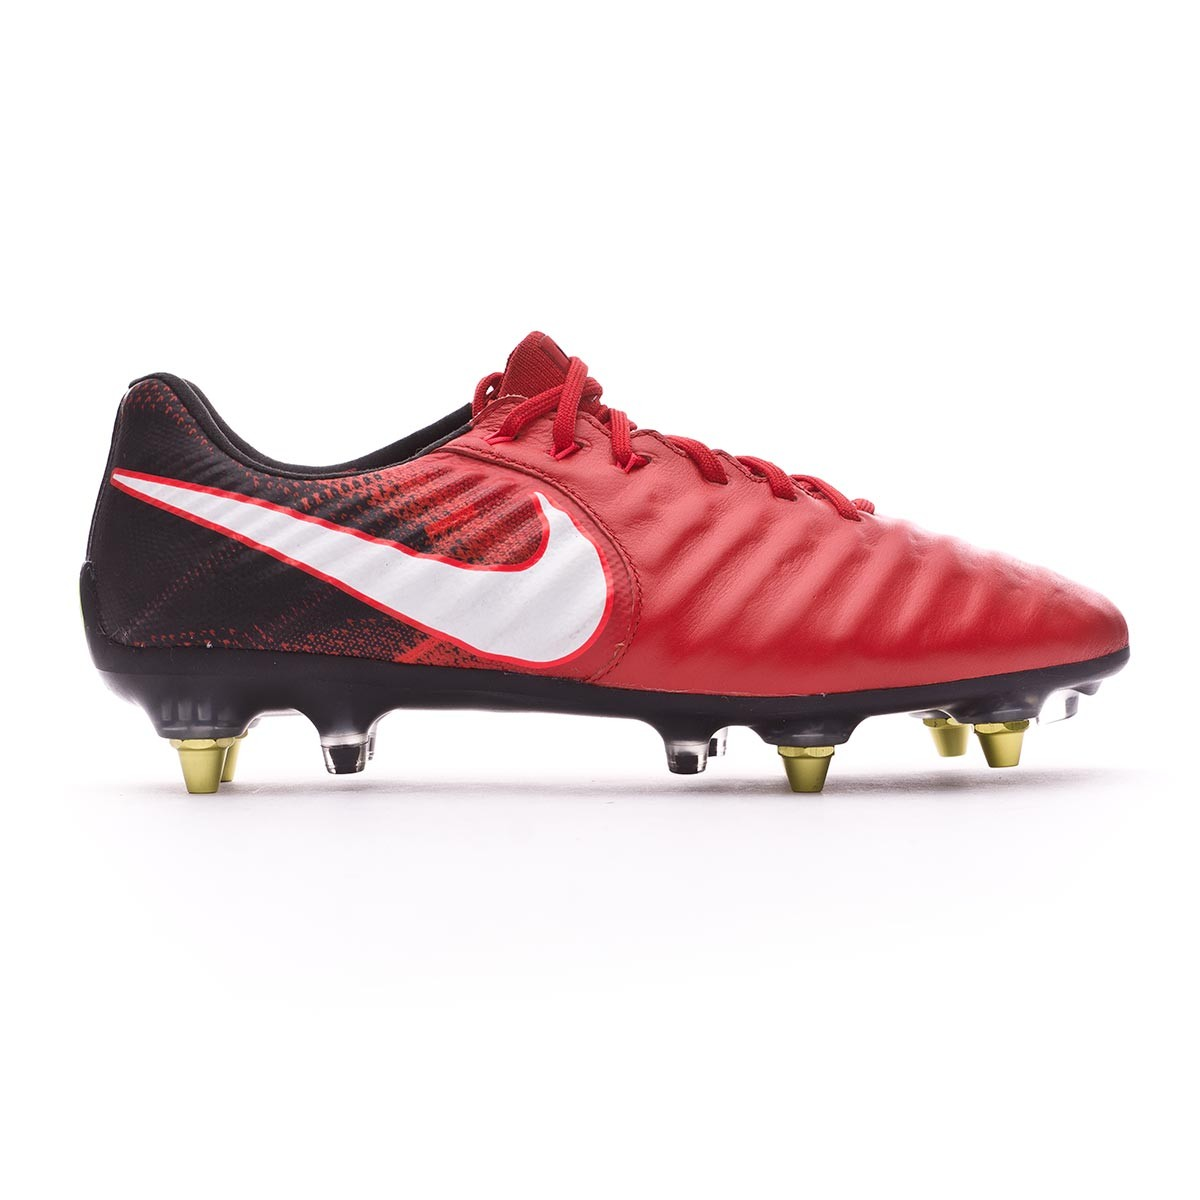 5aaa9c0dcc8f1 Zapatos de fútbol Nike Tiempo Legend VII Anti-Clog ACC SG-Pro  Black-White-University red - Tienda de fútbol Fútbol Emotion